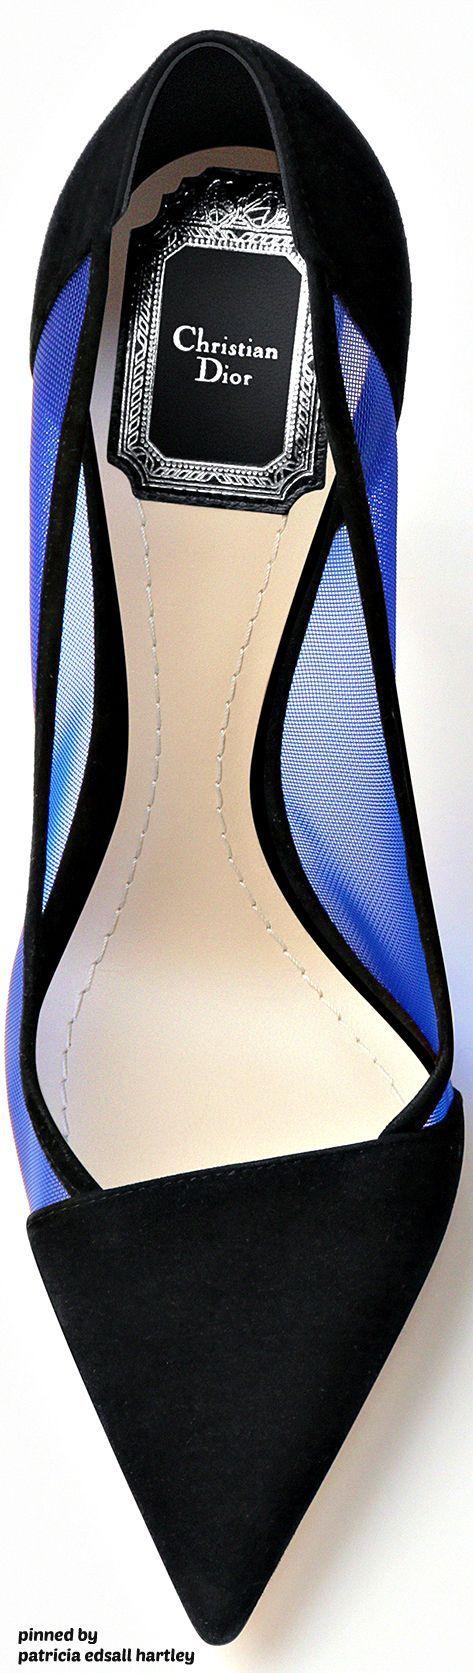 Trendy High Heels Inspiration    Christian Dior 2016  - #Heels https://talkfashion.net/shoes/heels/trendy-high-heels-inspiration-christian-dior-2016/